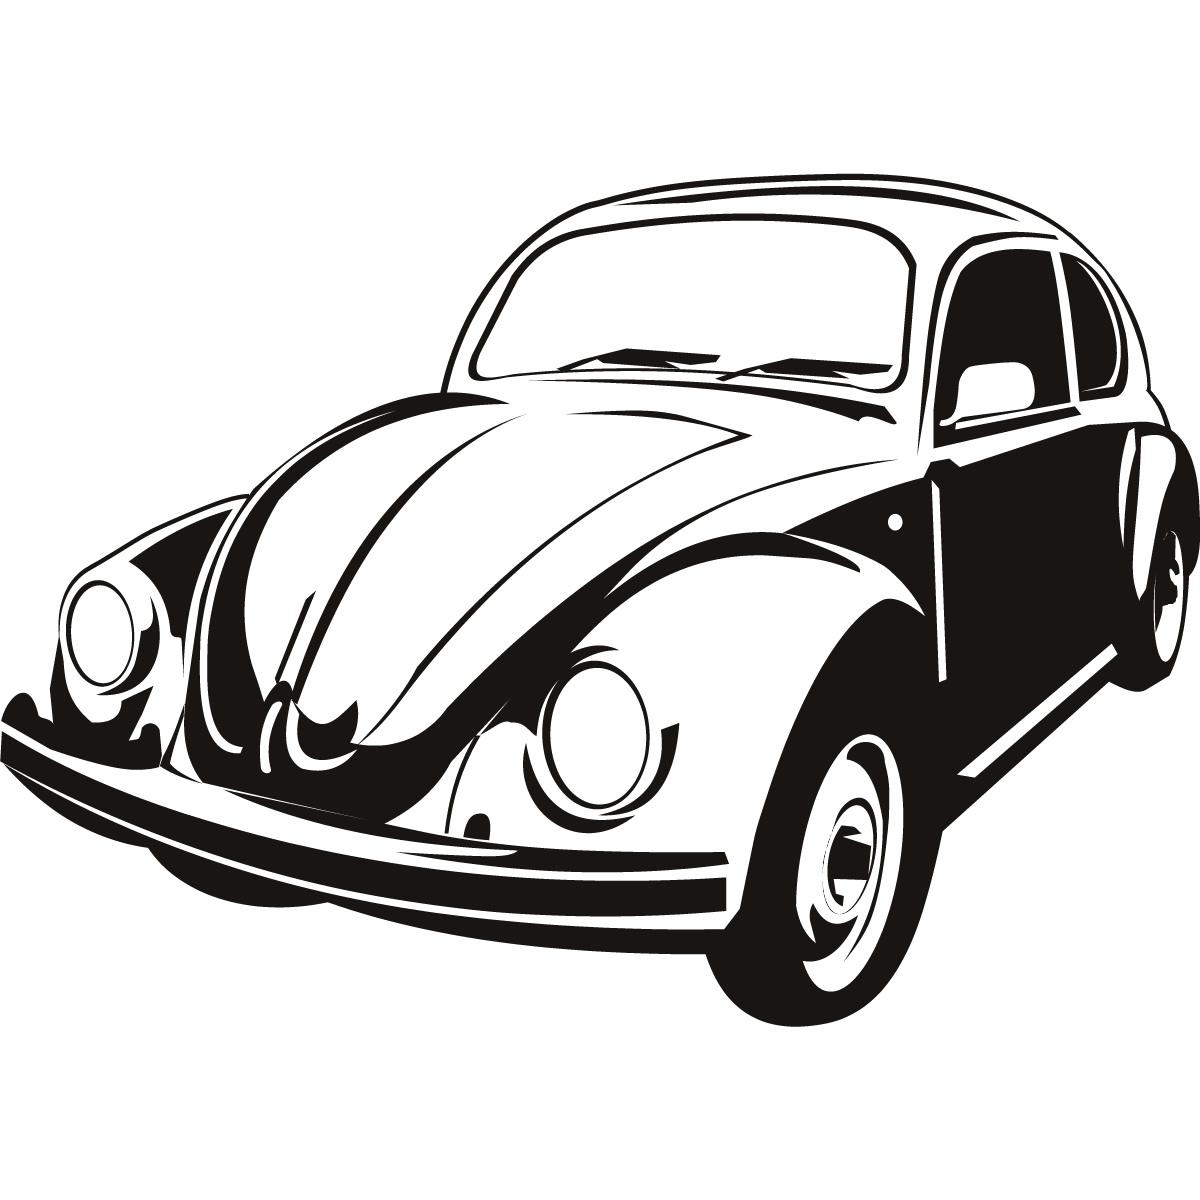 Vw Beetle Cars Transport Wall Art Sticker Wall Decal